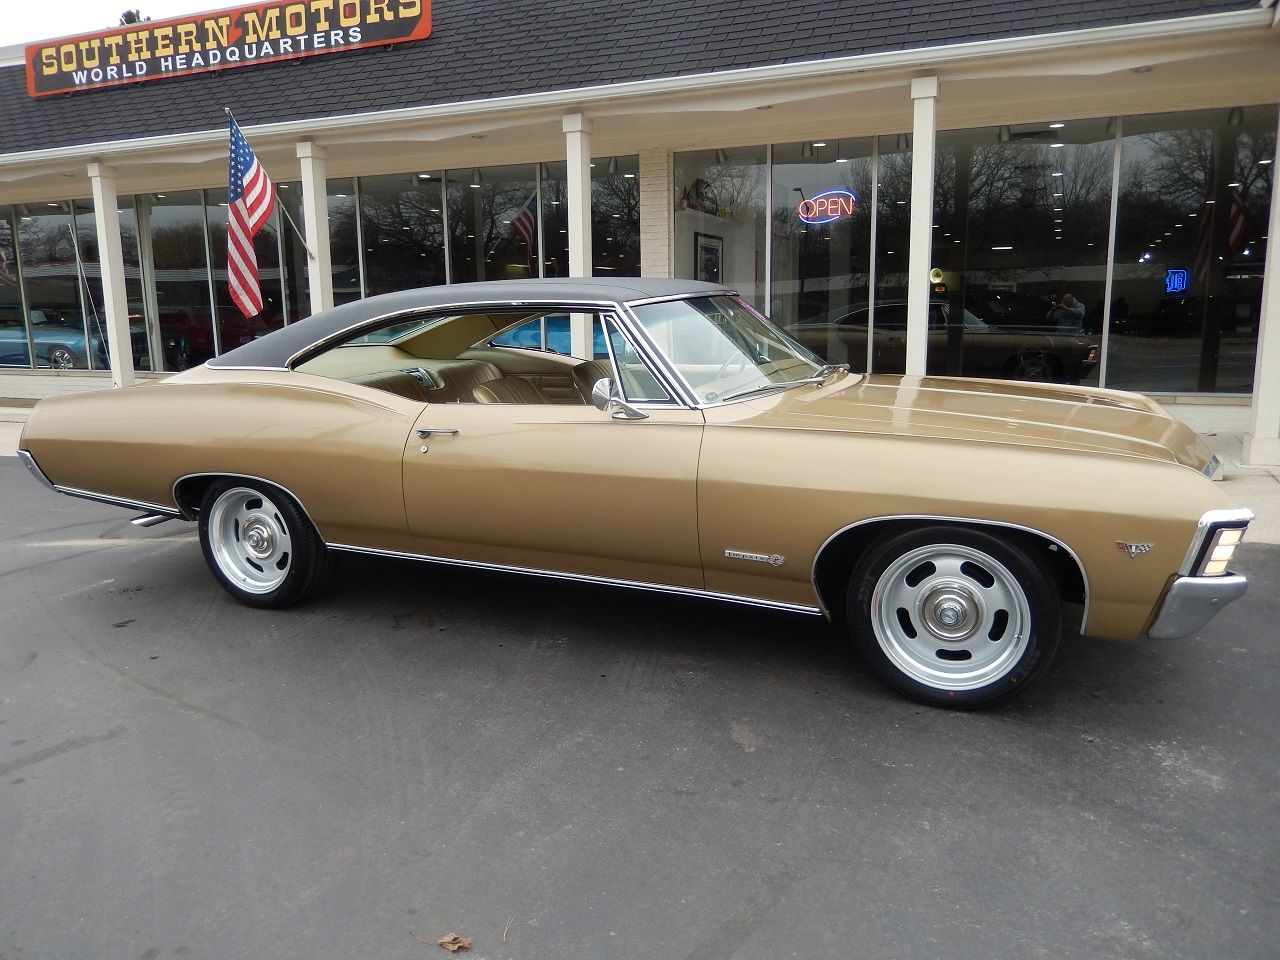 Southern motors 1967 chevrolet impala ss